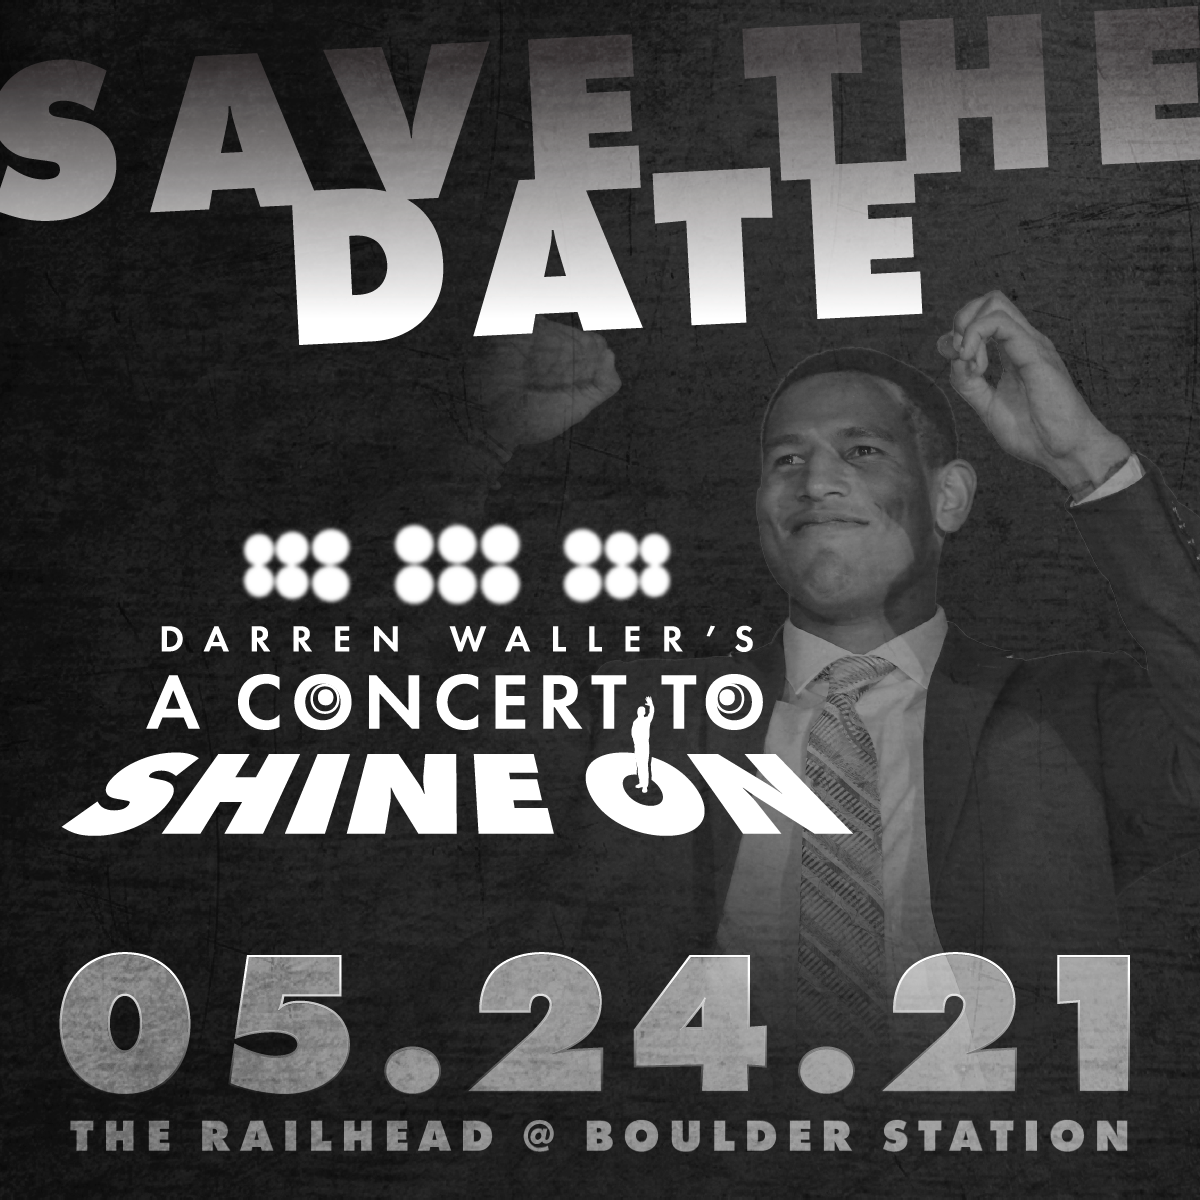 https://darrenwaller.org/a-concert-to-shine-one